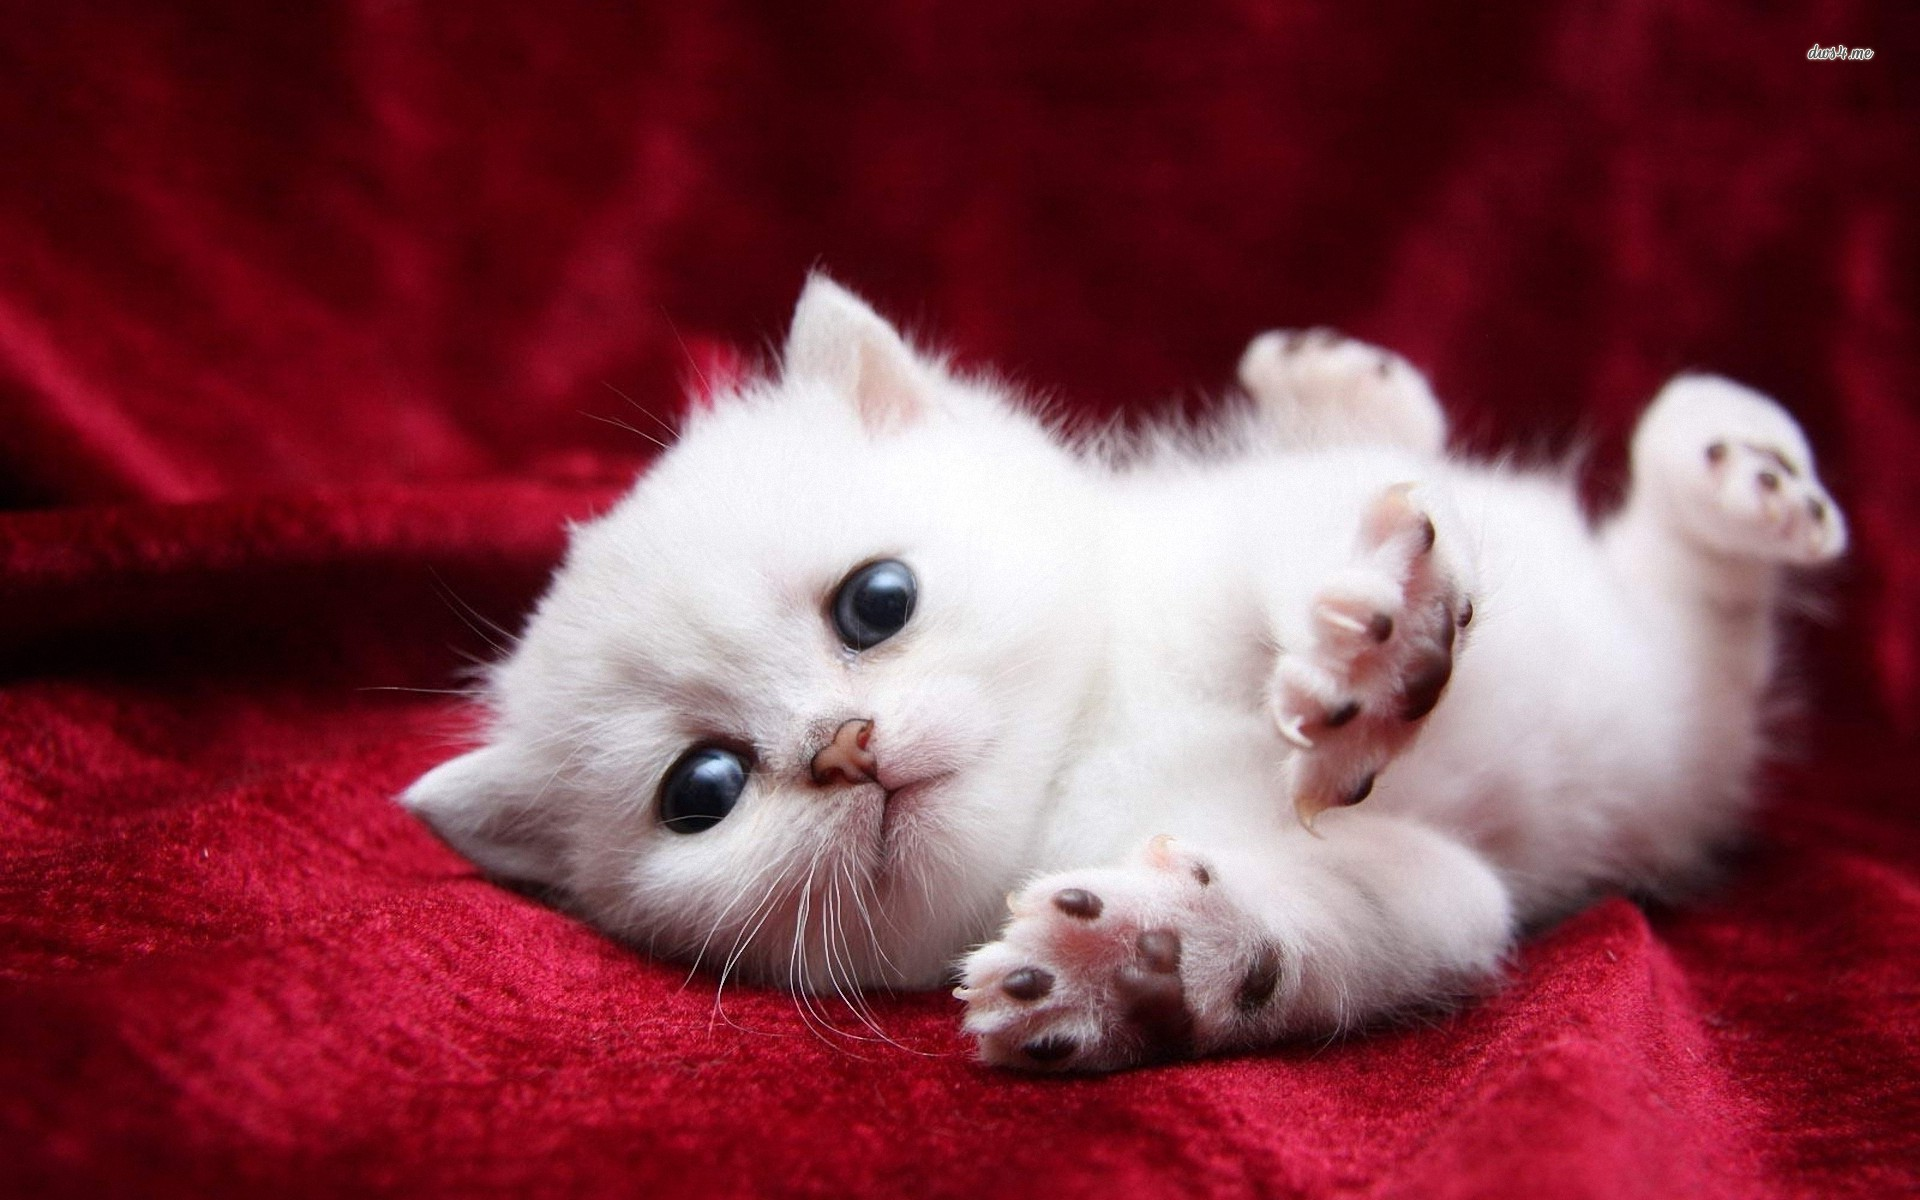 Kitten Full HD Wallpaper And Background Image